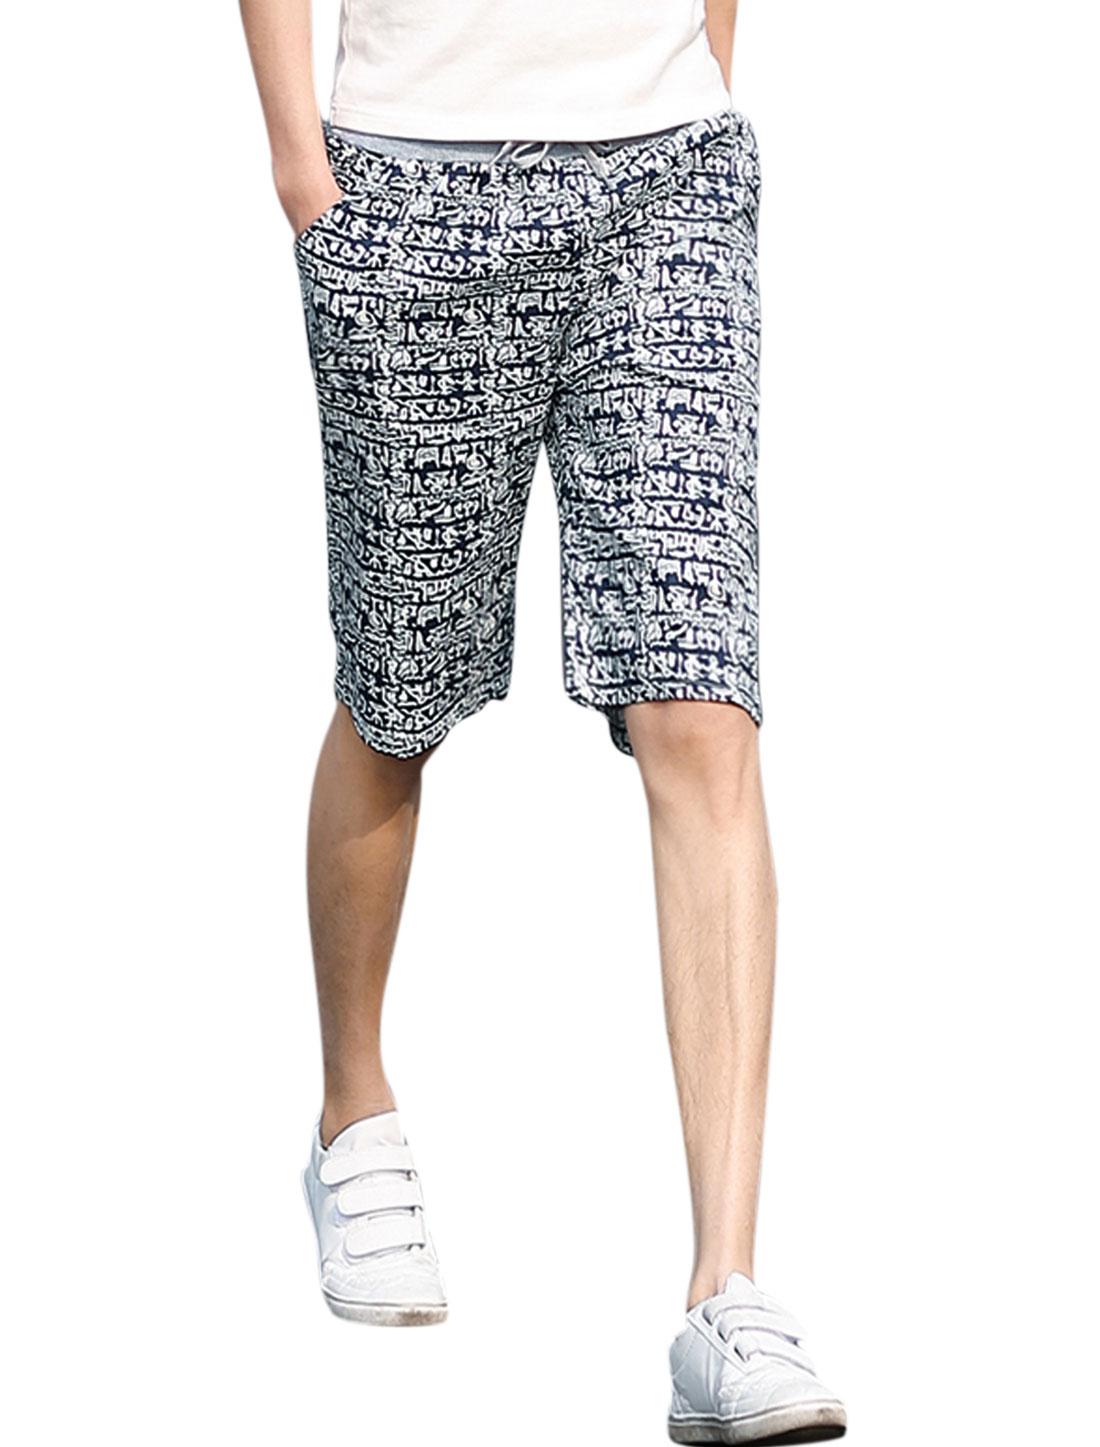 Man Novelty Prints Elastic Drawstring Waist Slant Pockets Beach Shorts Navy Blue White W32